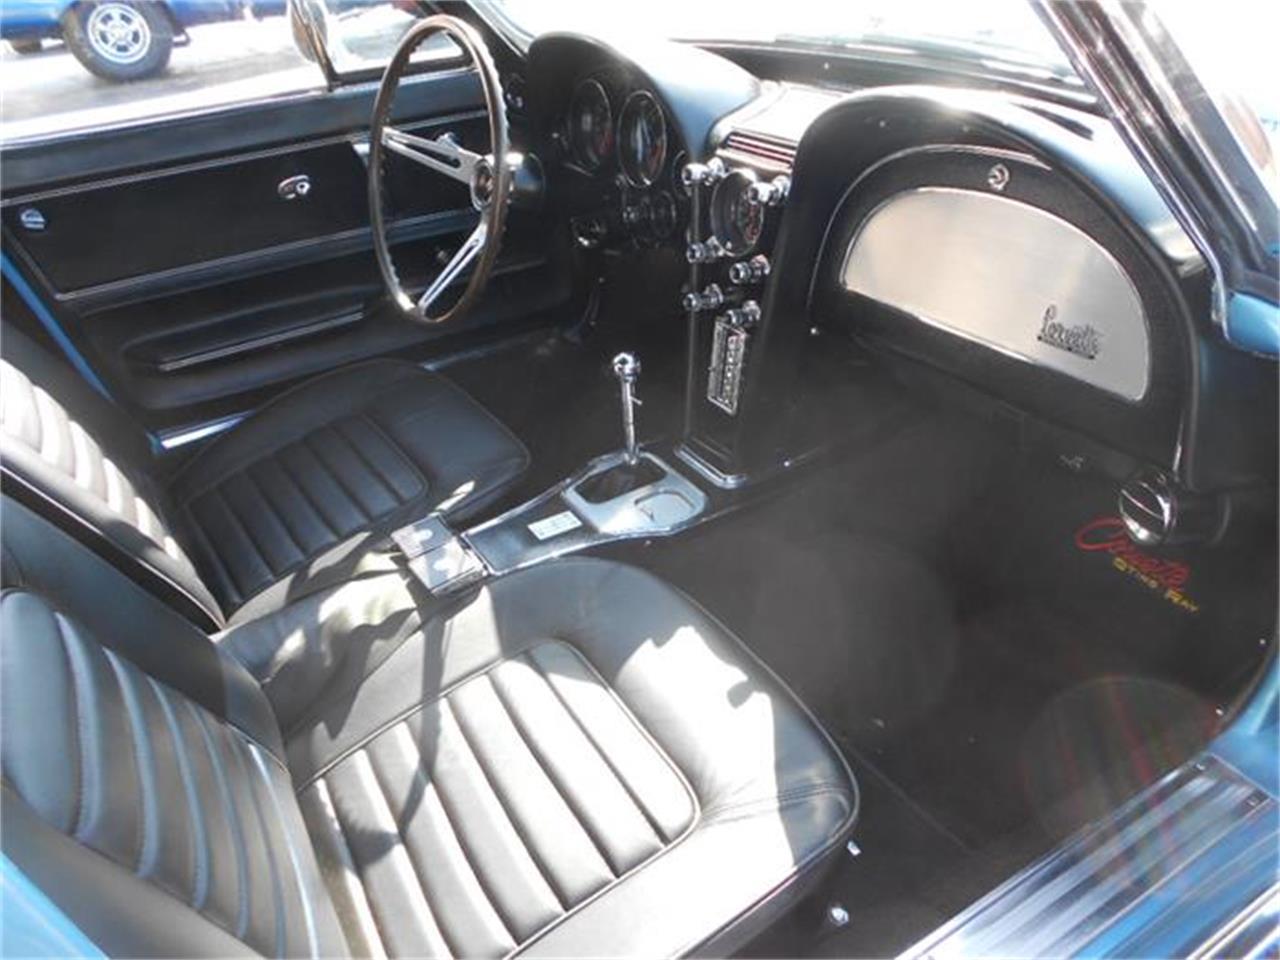 Large Picture of '66 Corvette located in Illinois - $79,000.00 - B2SE